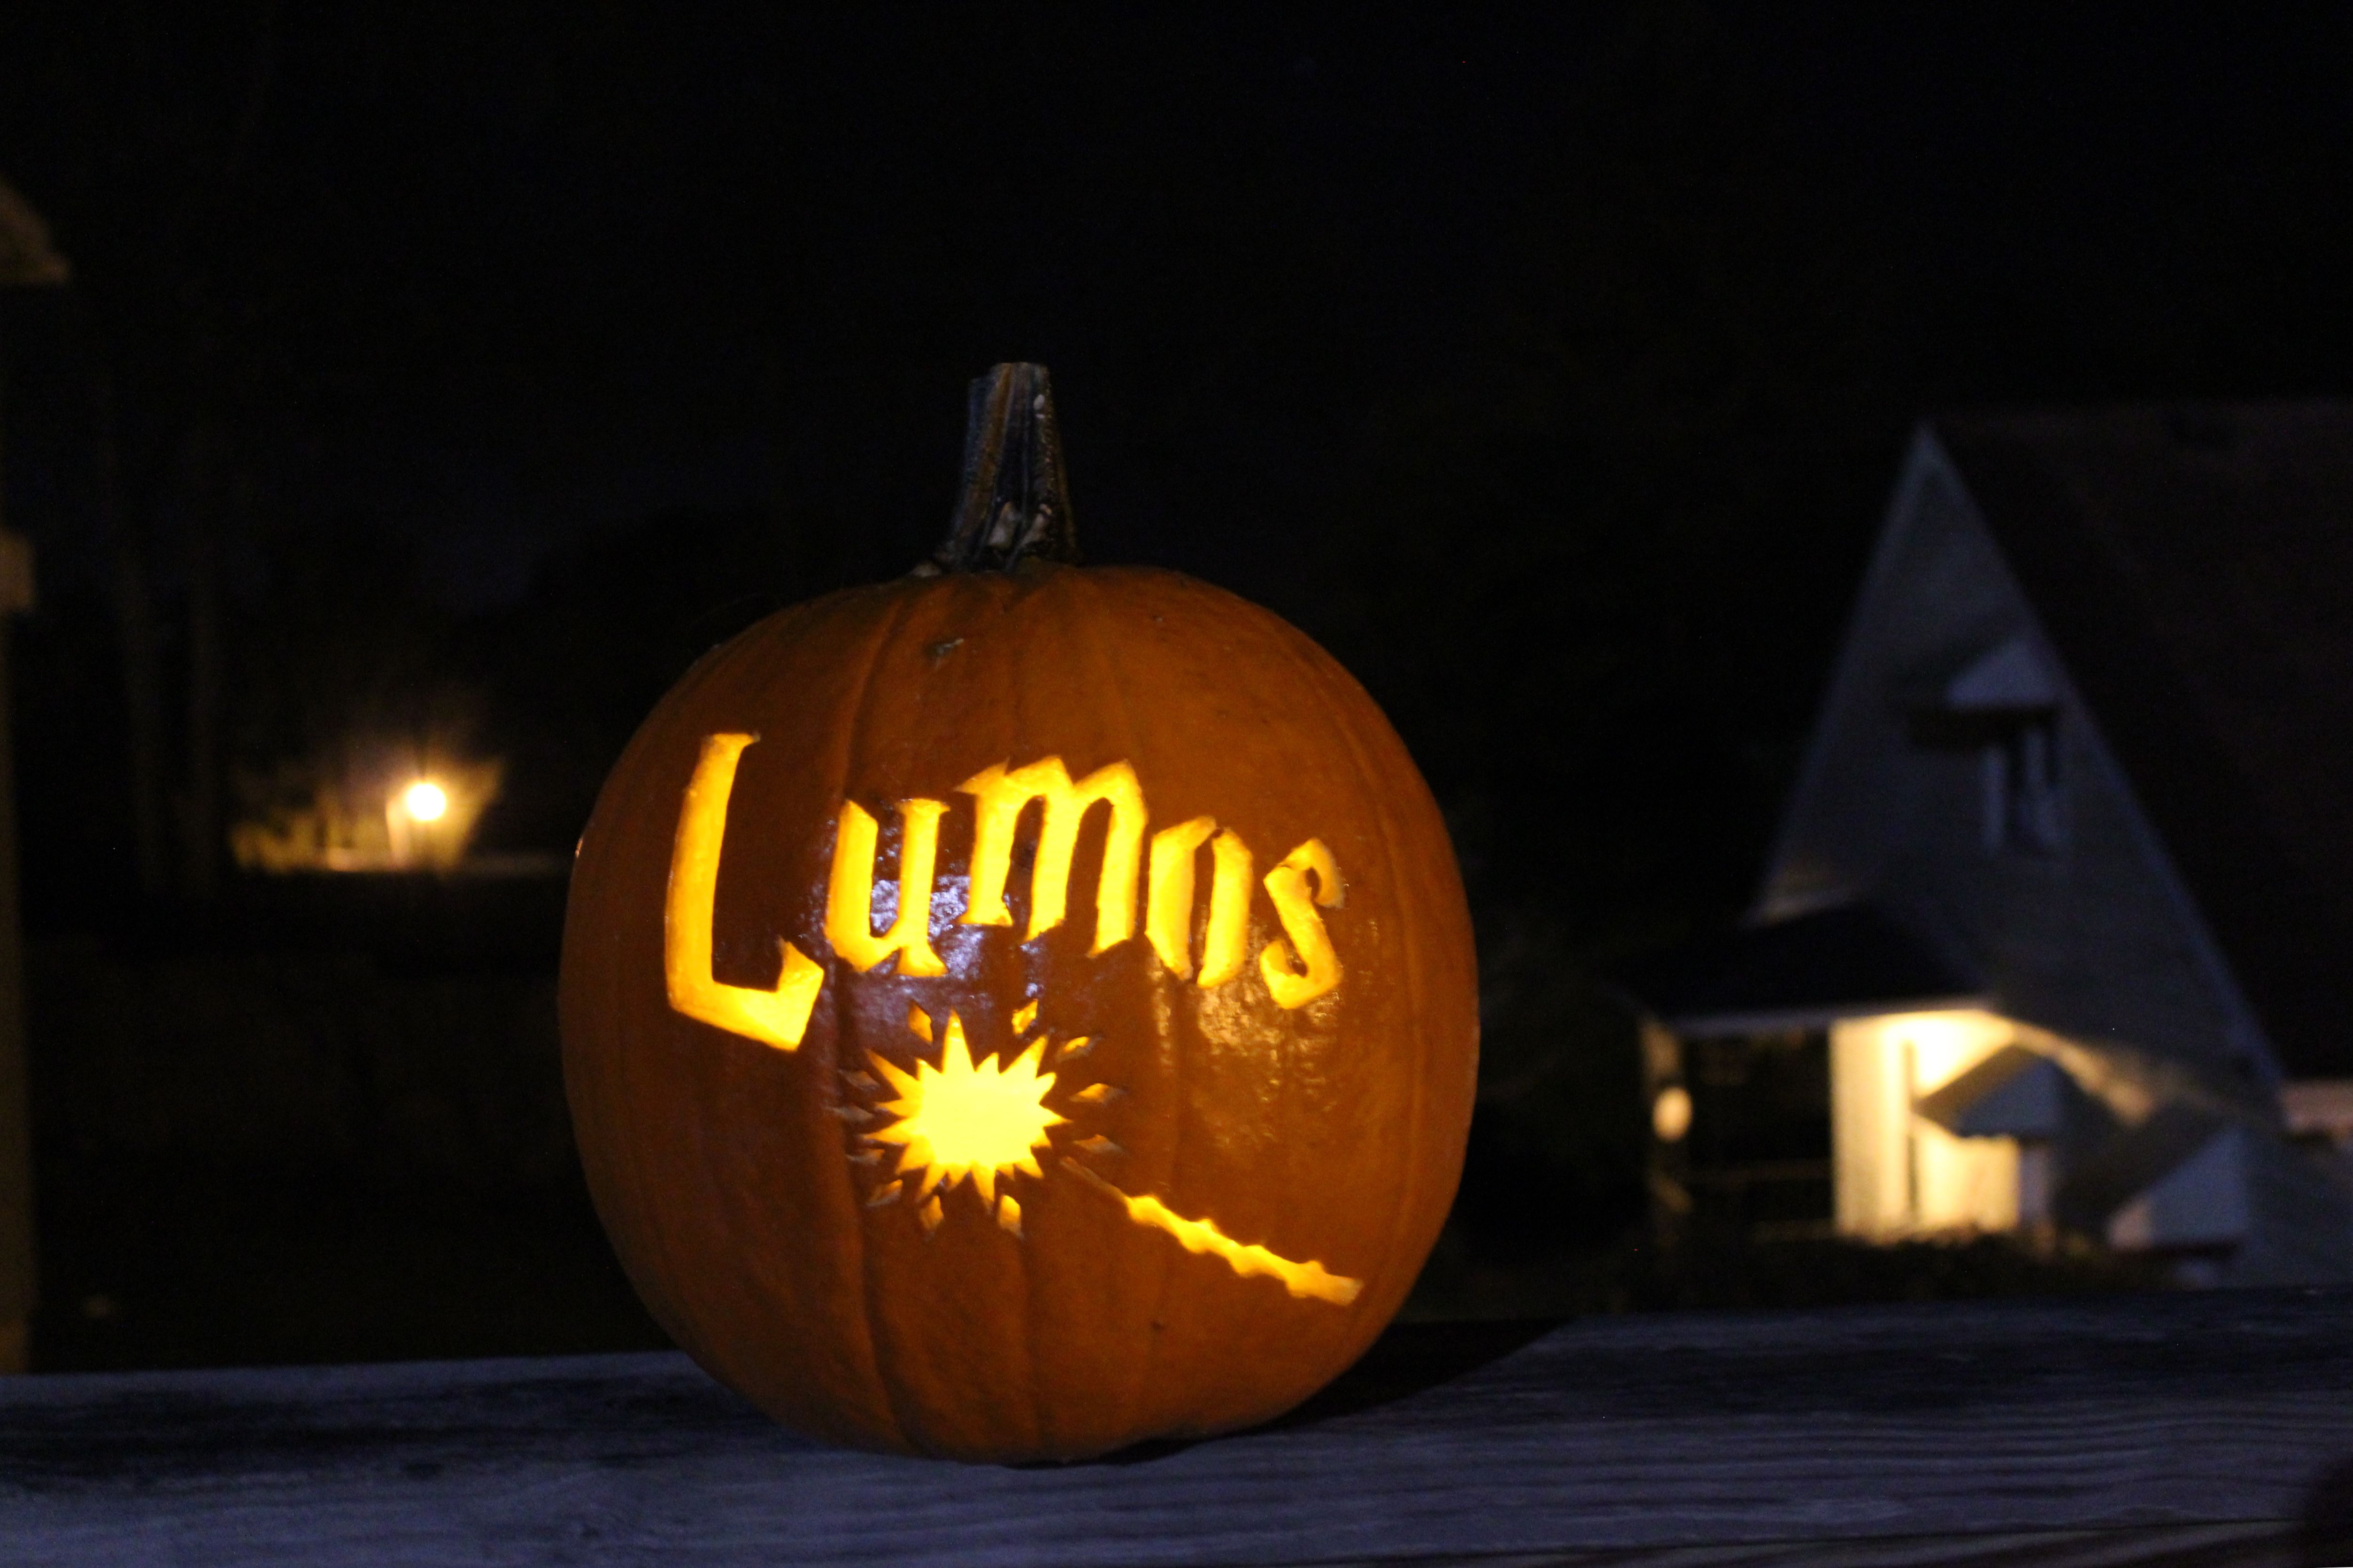 Harry Potter pumpkin carving ideas Lumos Harry potter